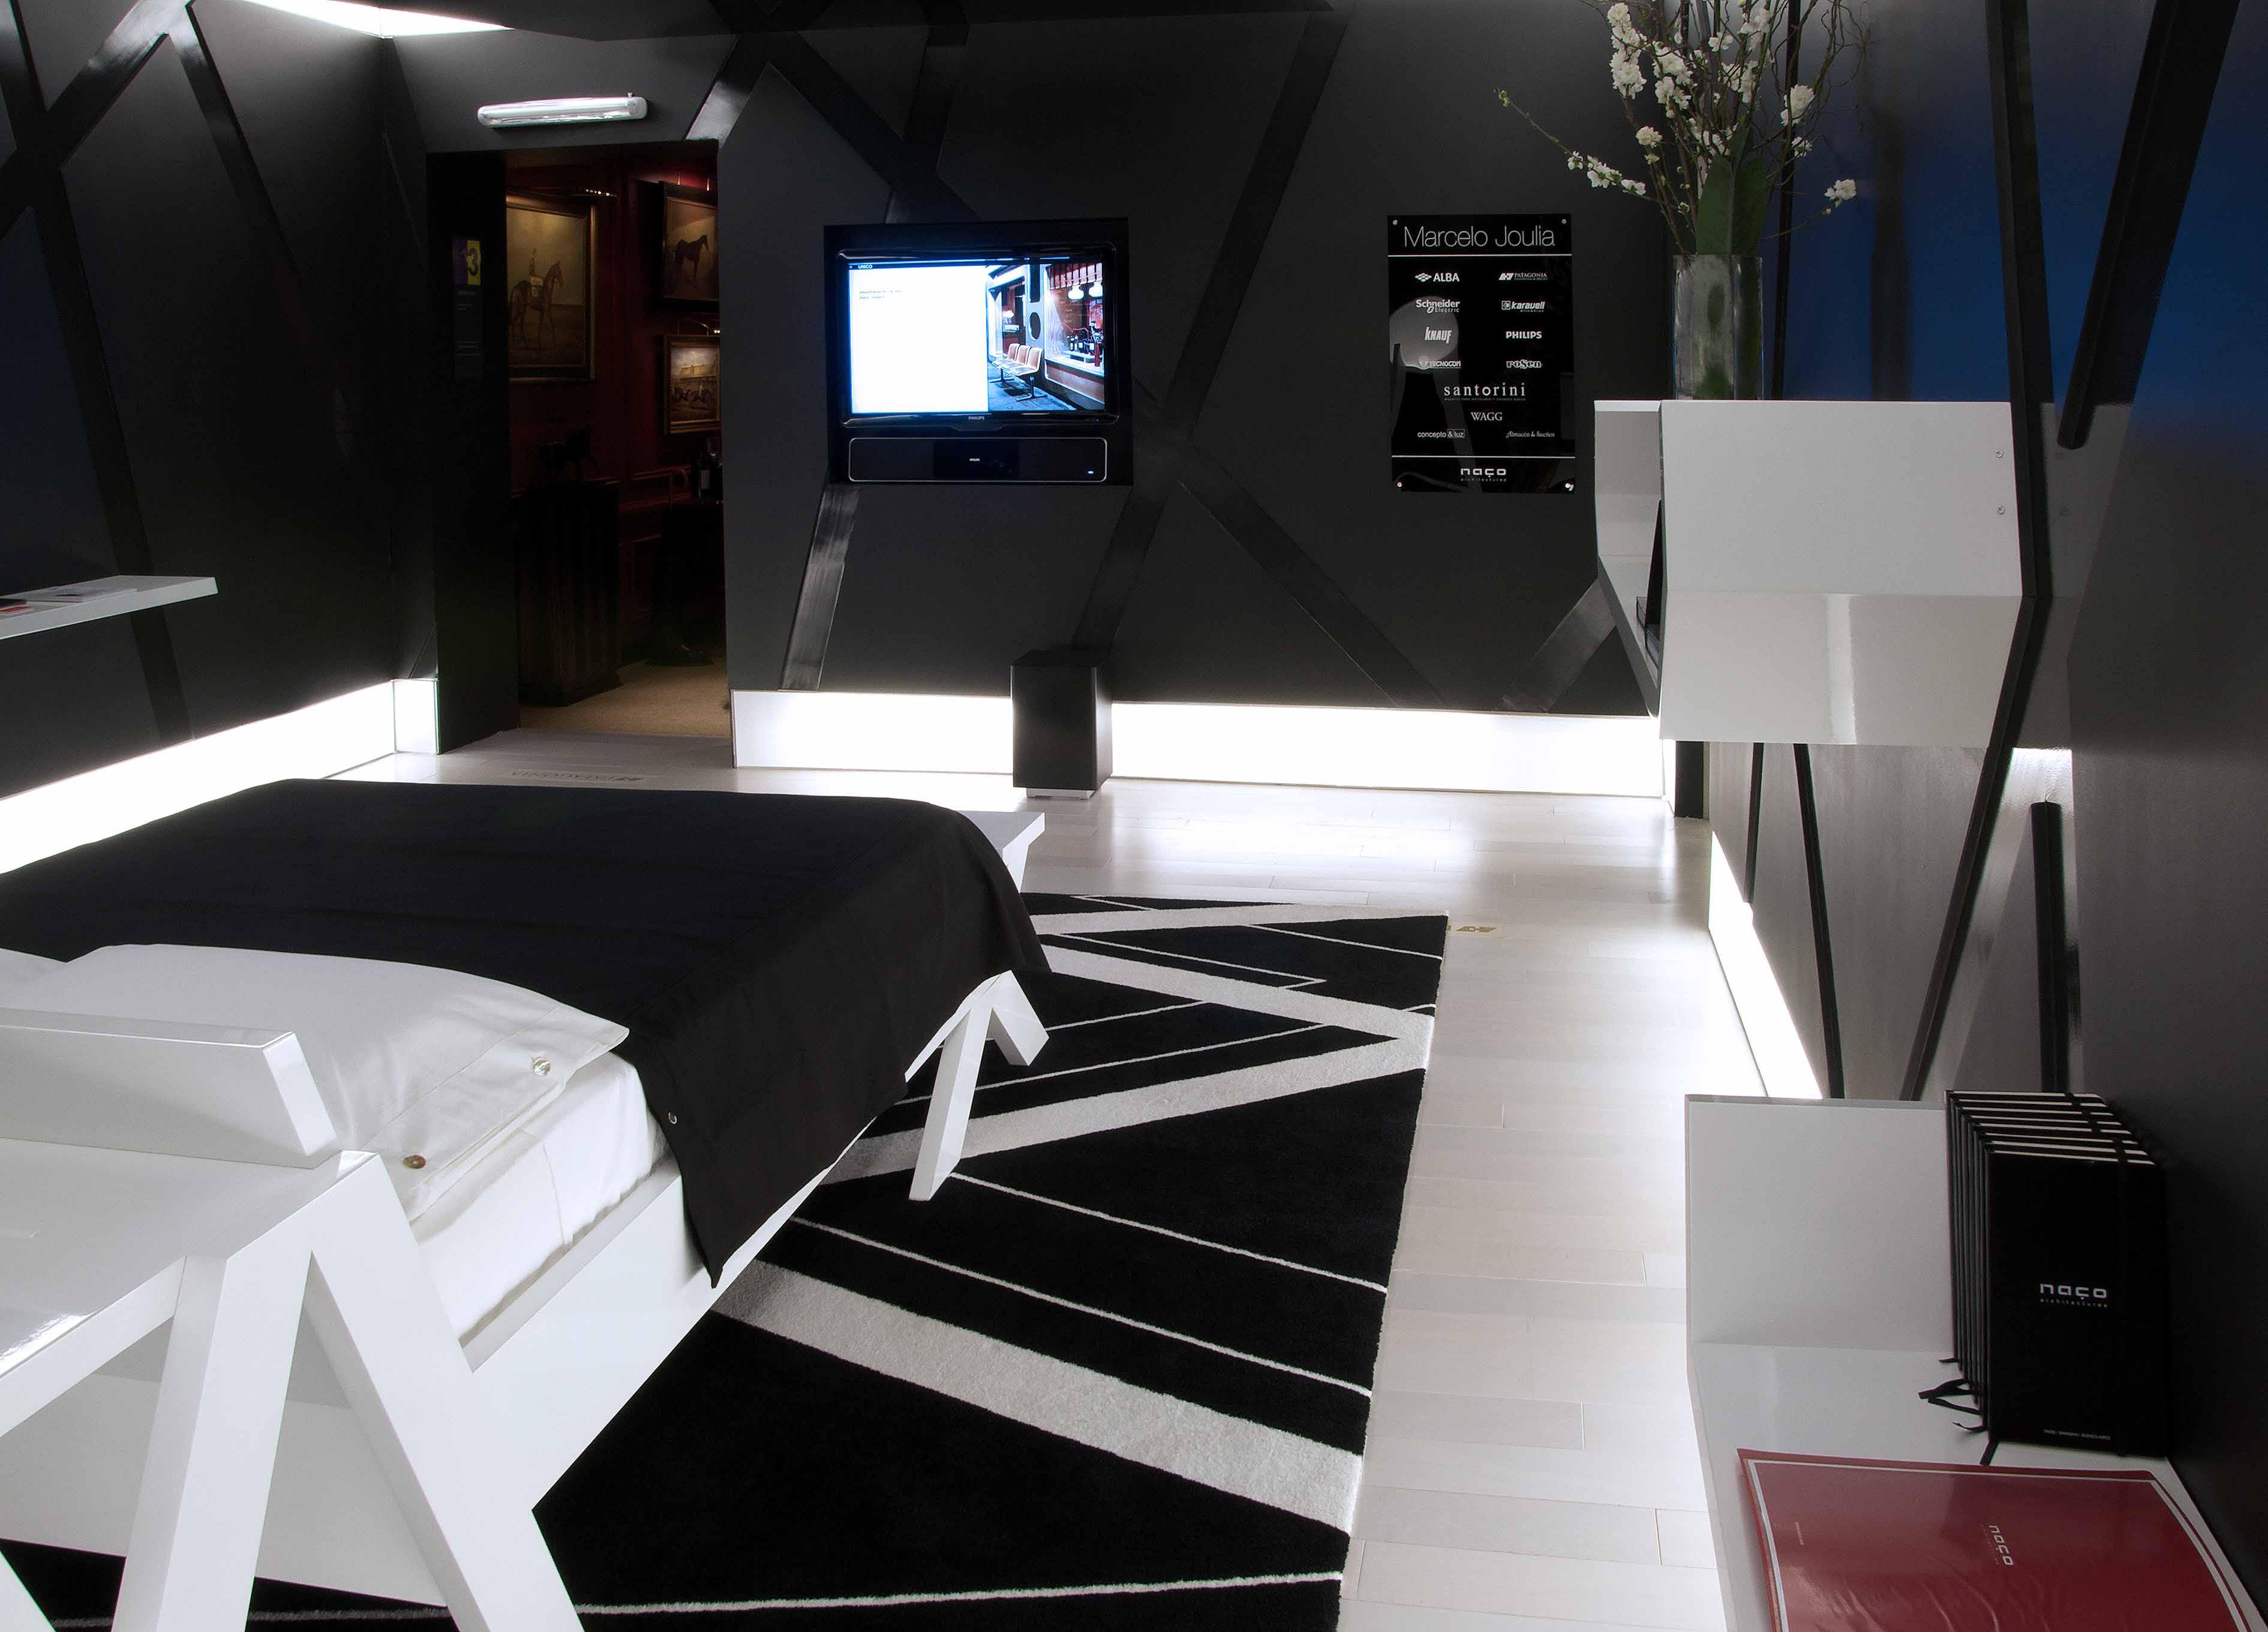 casa foa 2009: espacio n° 13 - dormitorio black & white por